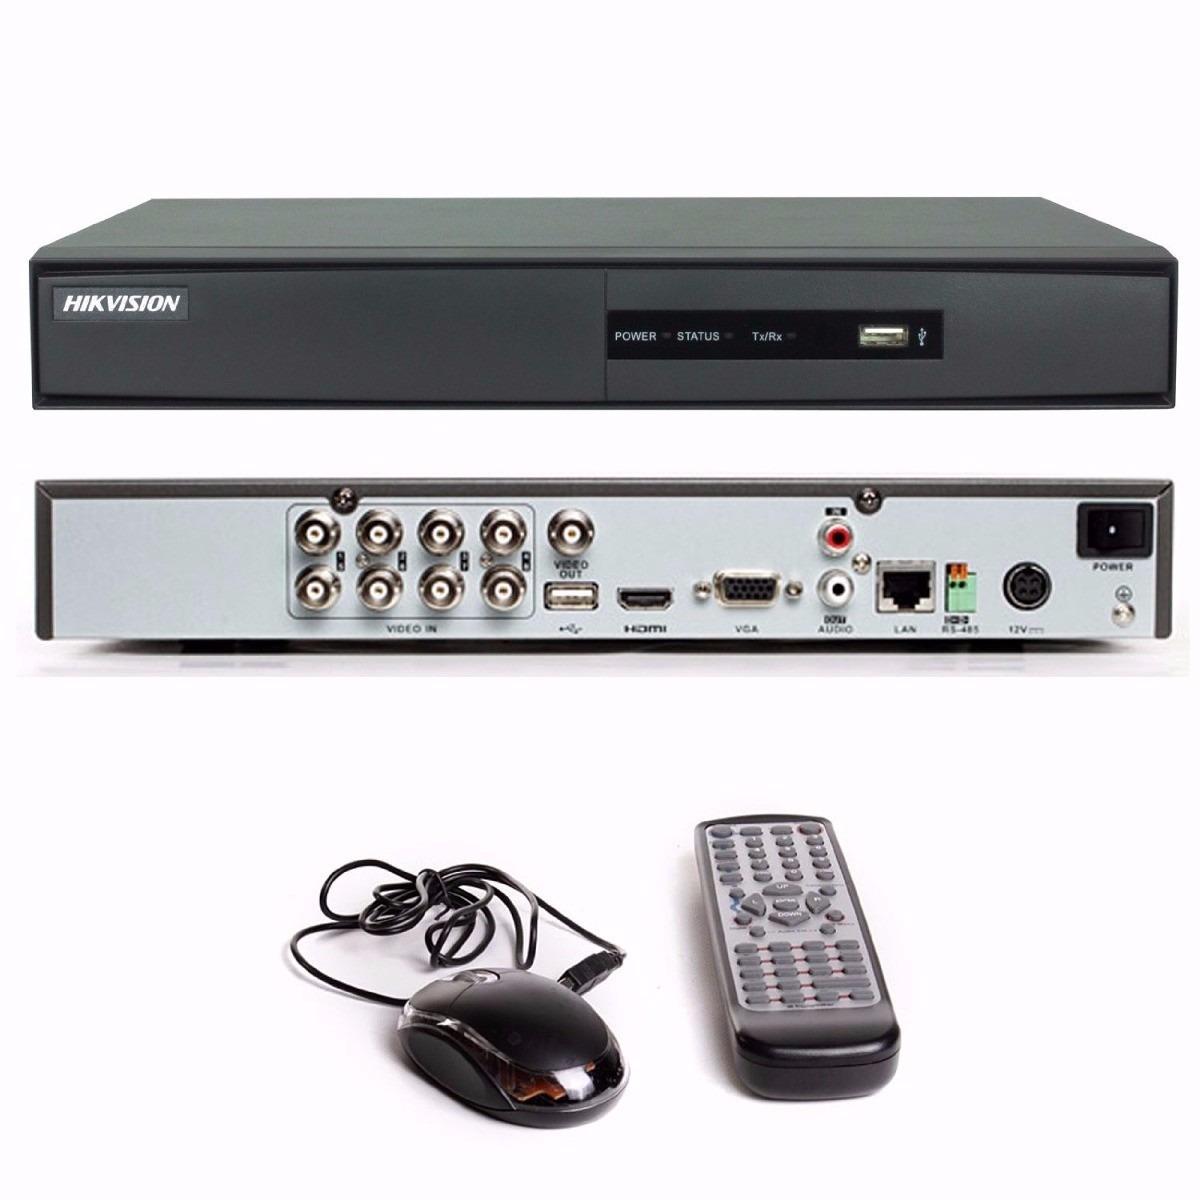 Dvr Hikvision Turbo Hd 8 Canais Em Hd 720p E Fuul Hd 1080p